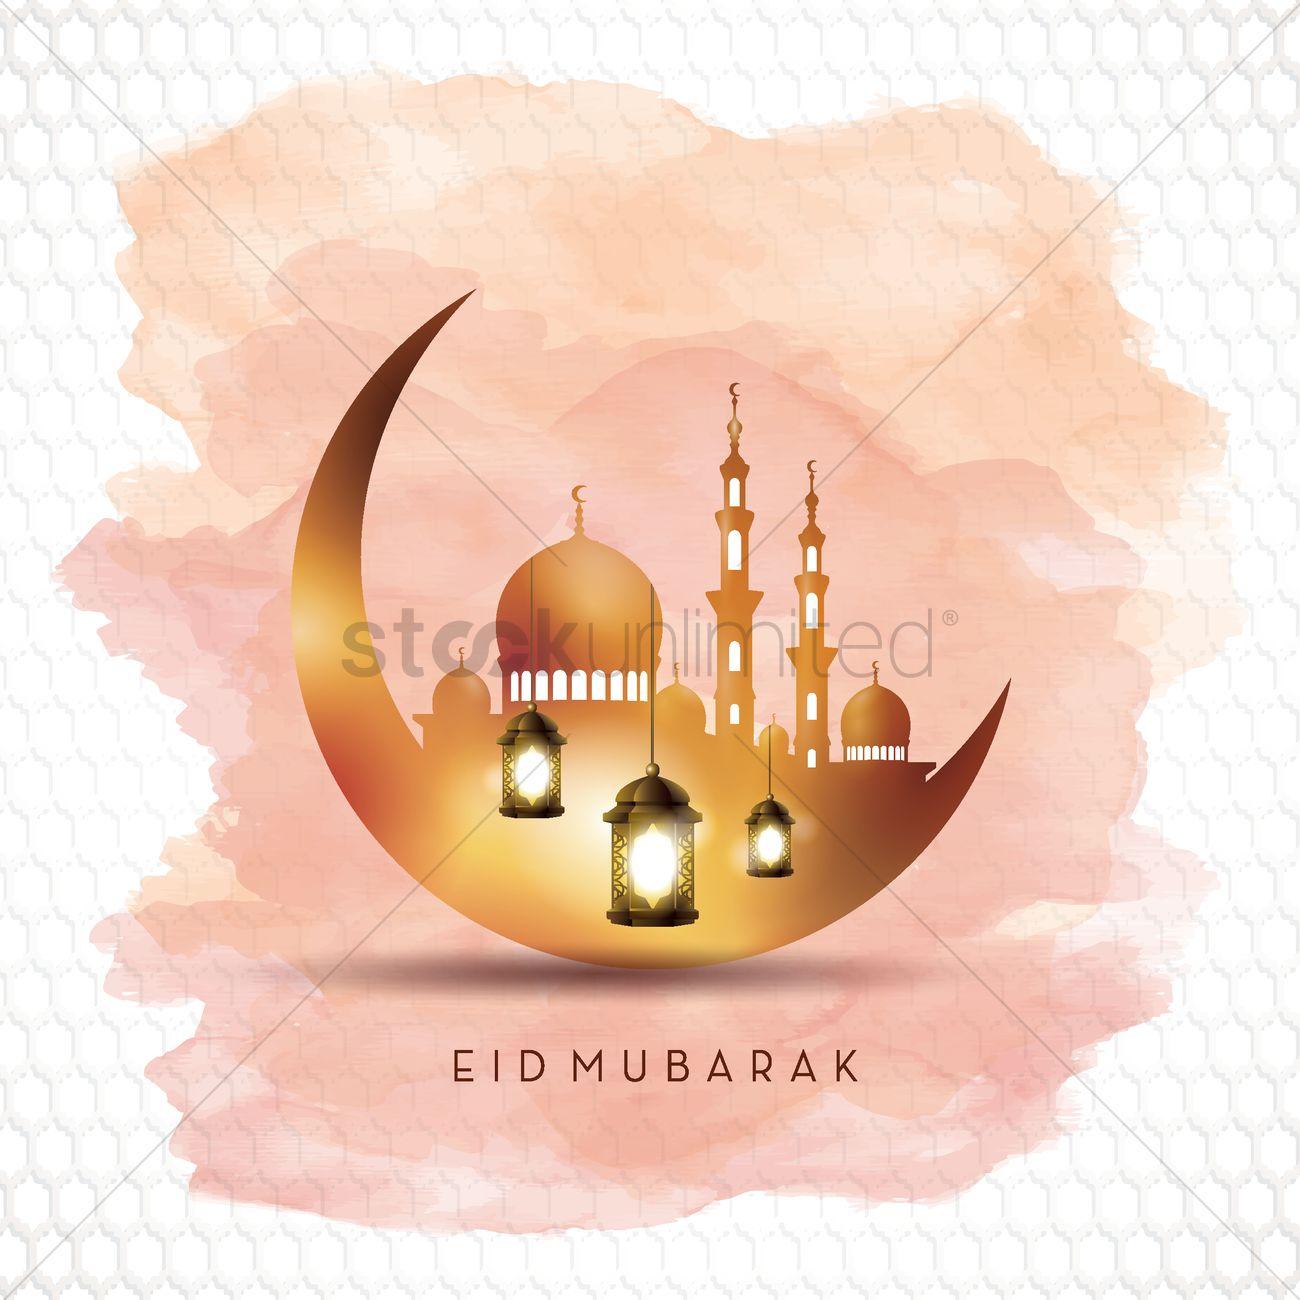 Eid mubarak greeting vector image 1828228 stockunlimited eid mubarak greeting vector graphic m4hsunfo